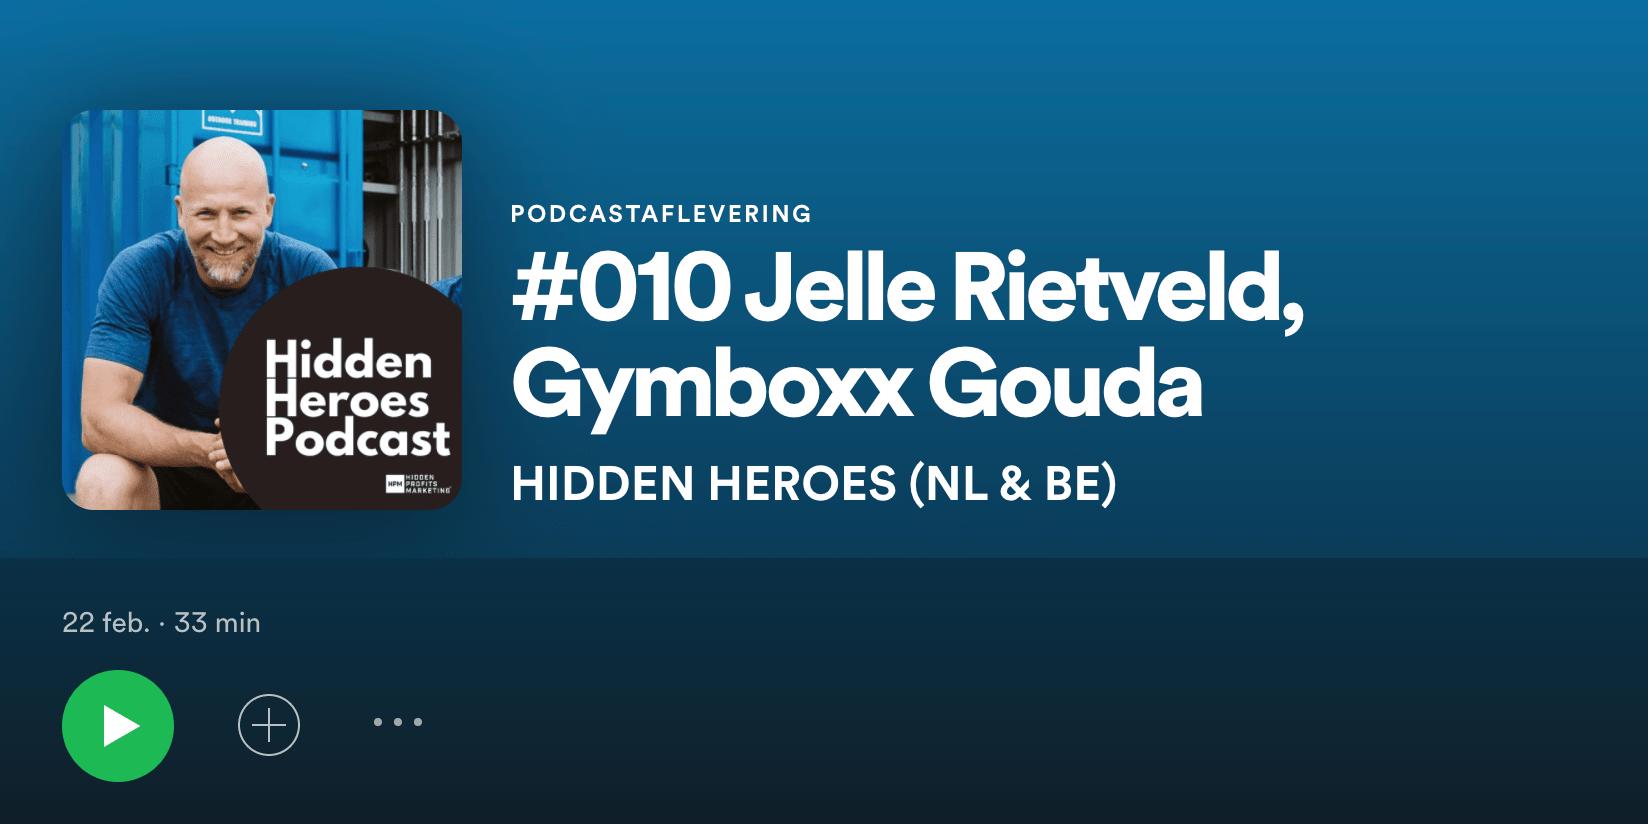 Podcast Jelle Rietveld hidden heroes 010